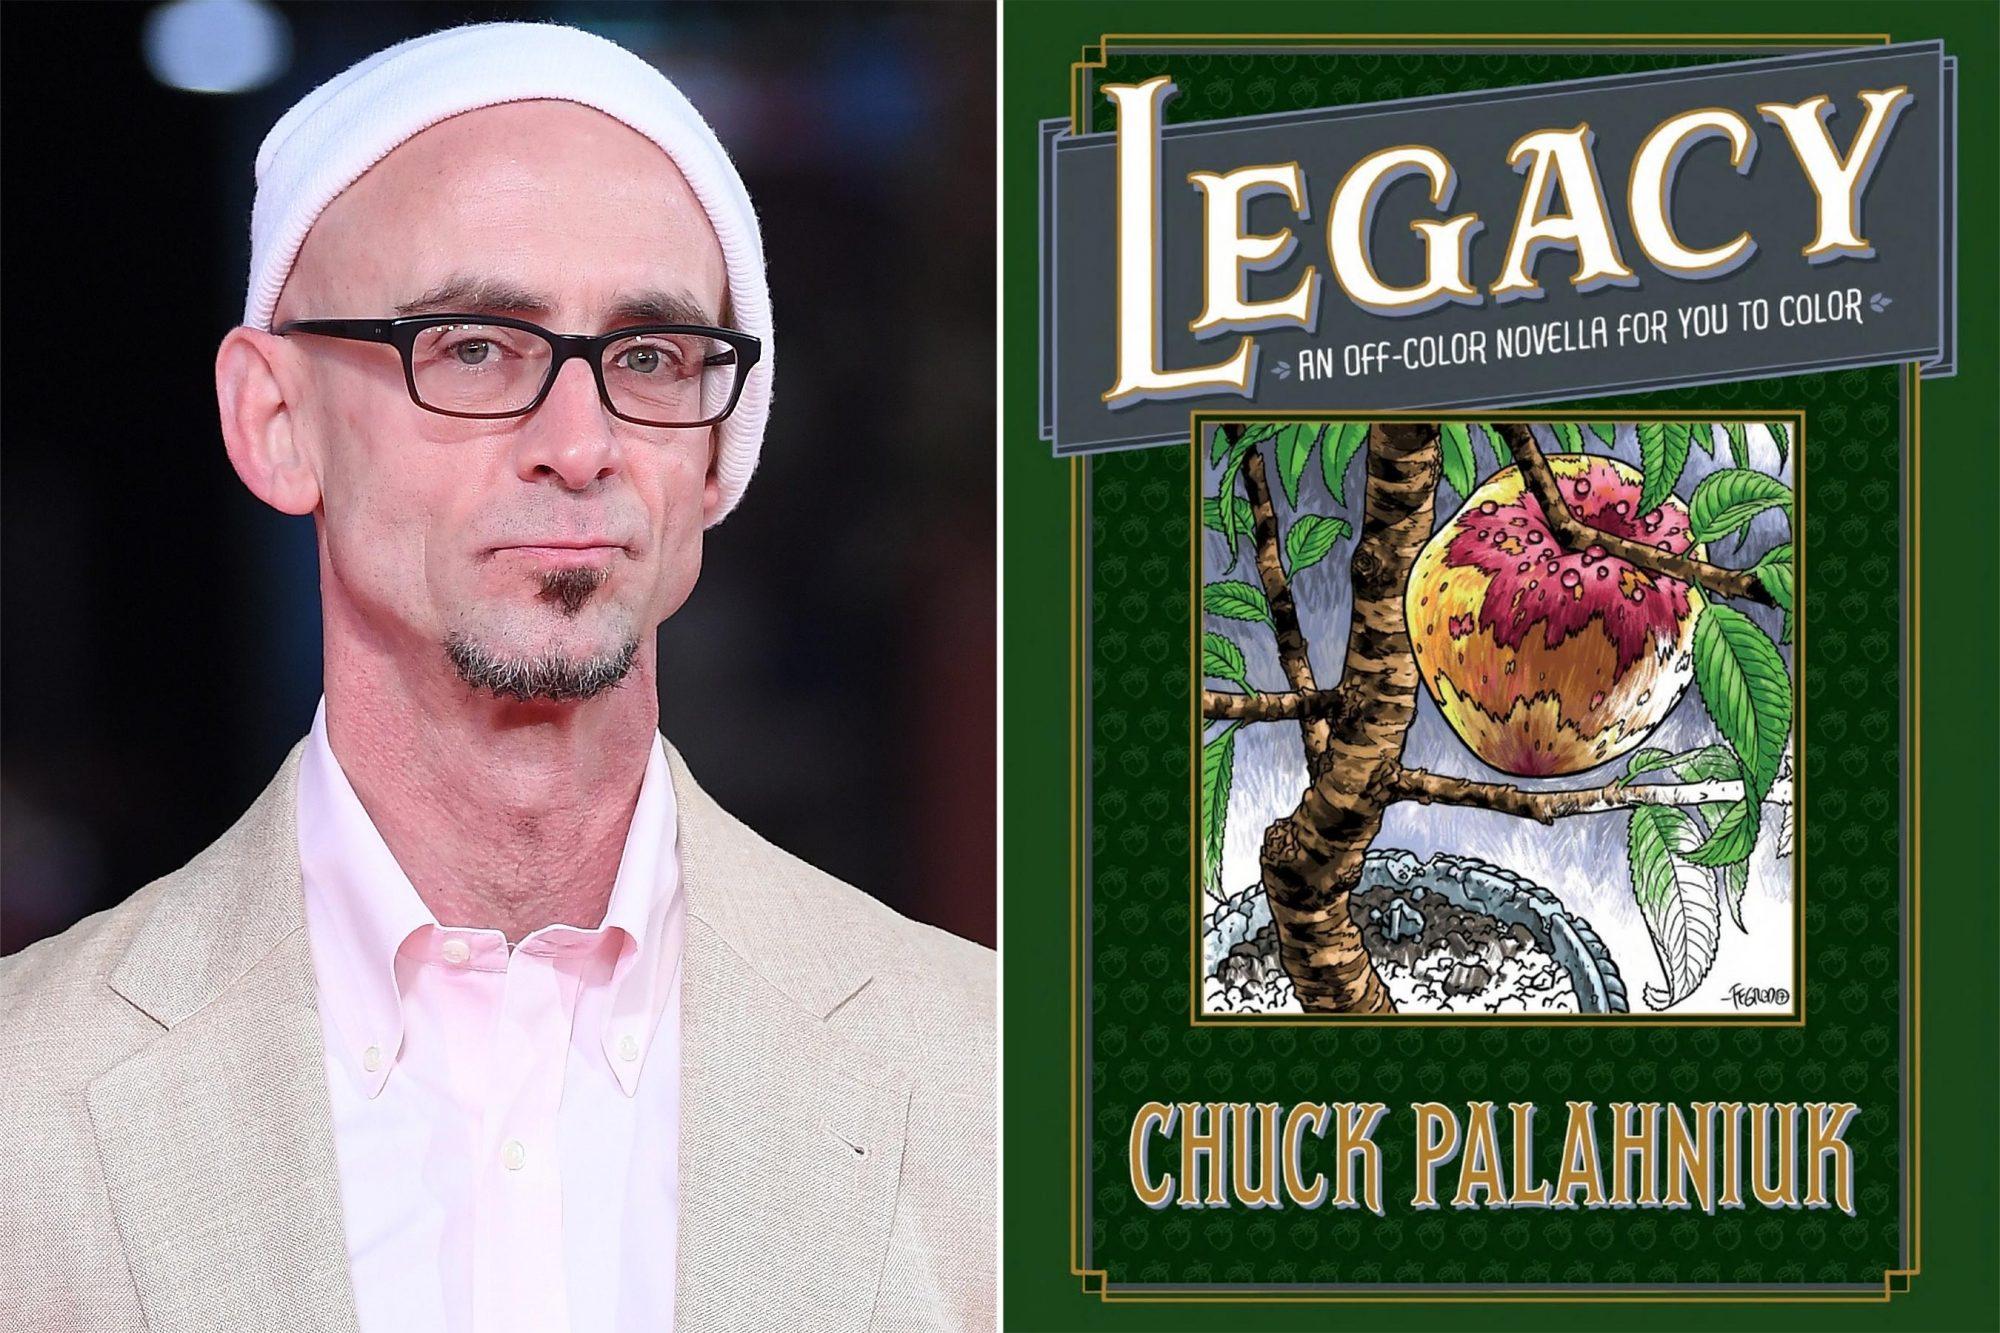 Chuck Palahniuk-Legacy